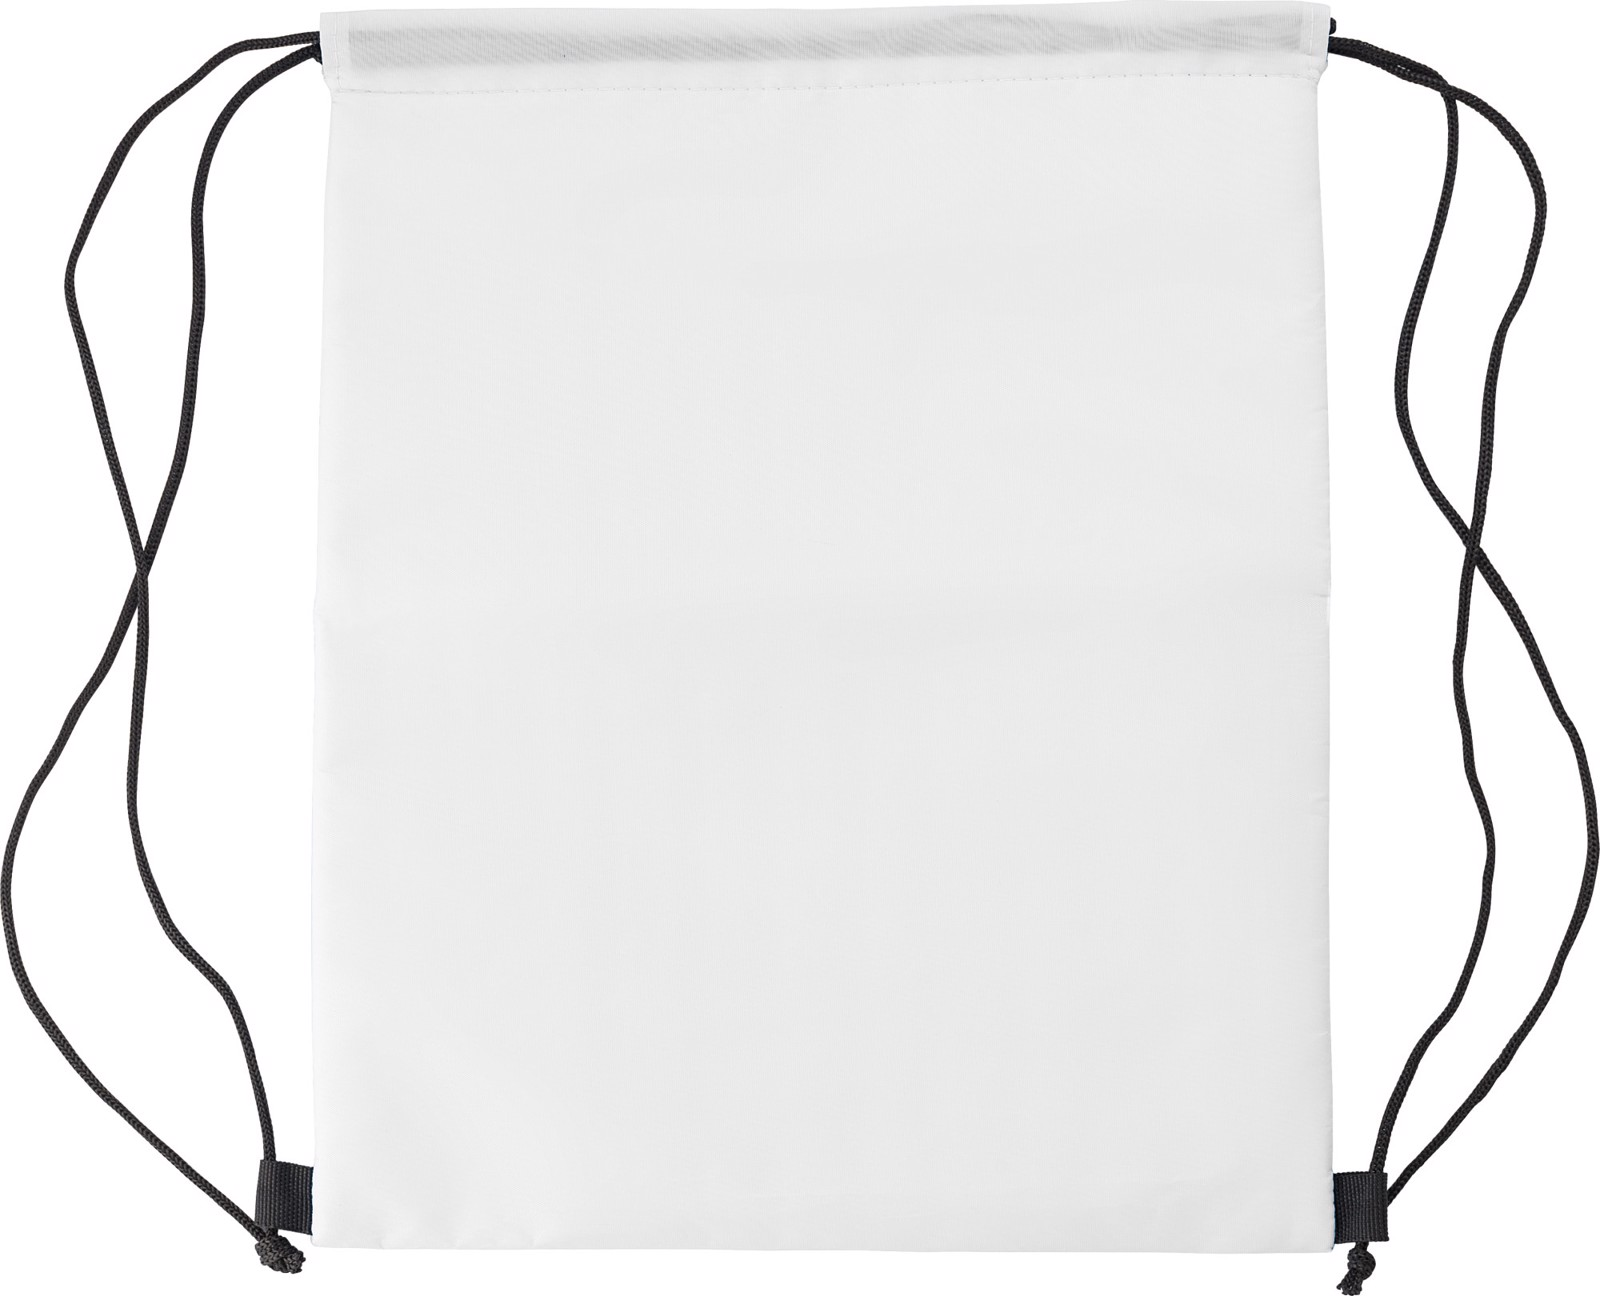 Polyester (210D) cooler bag - White